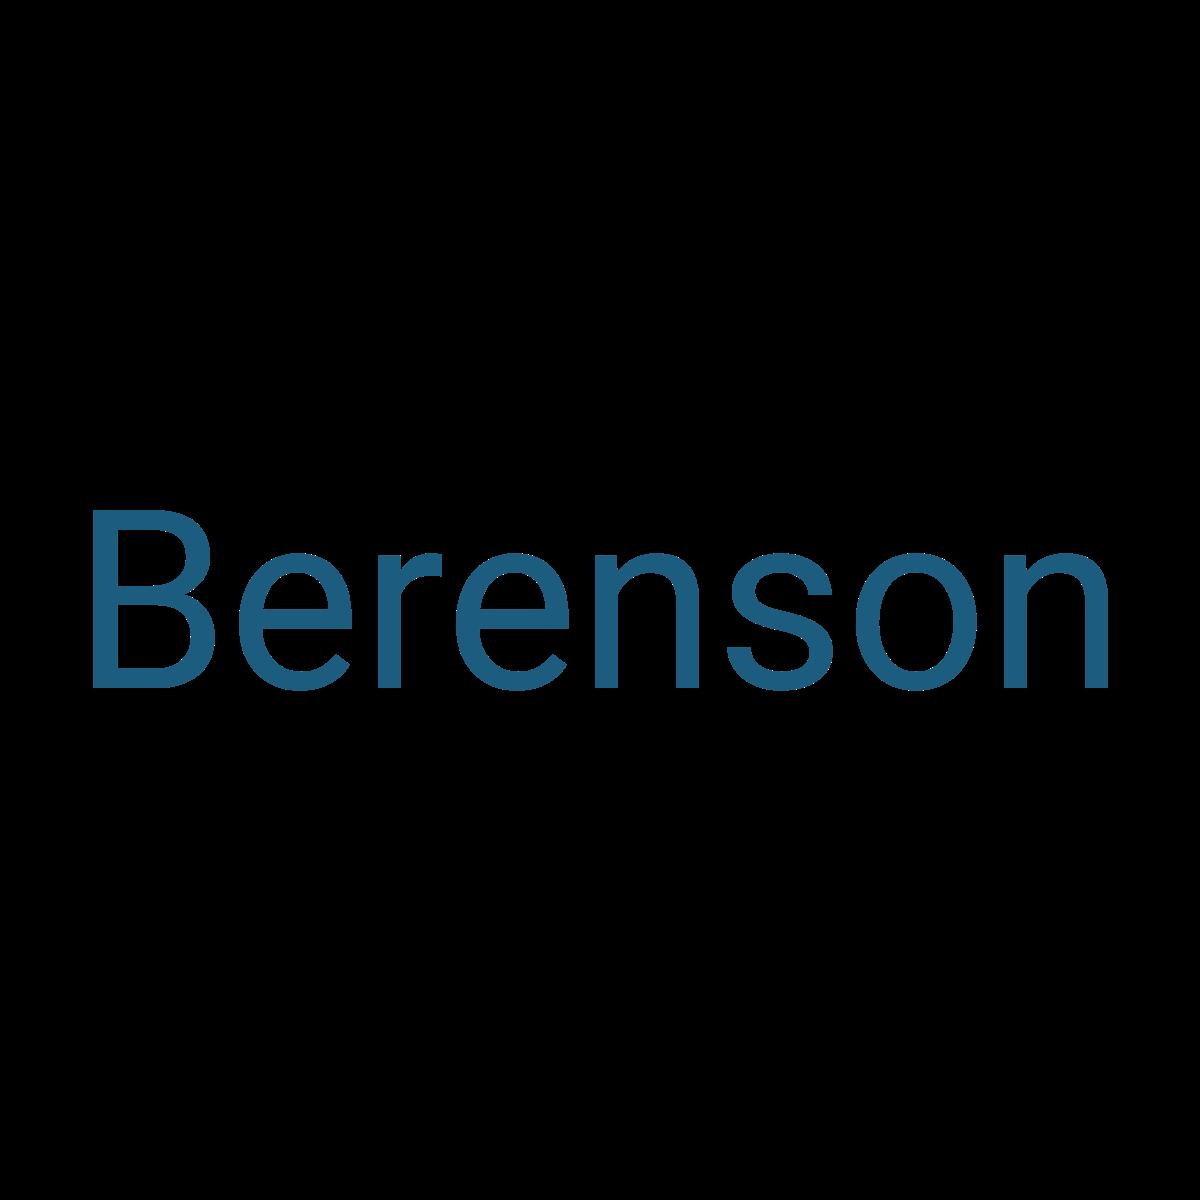 BERENSON logo